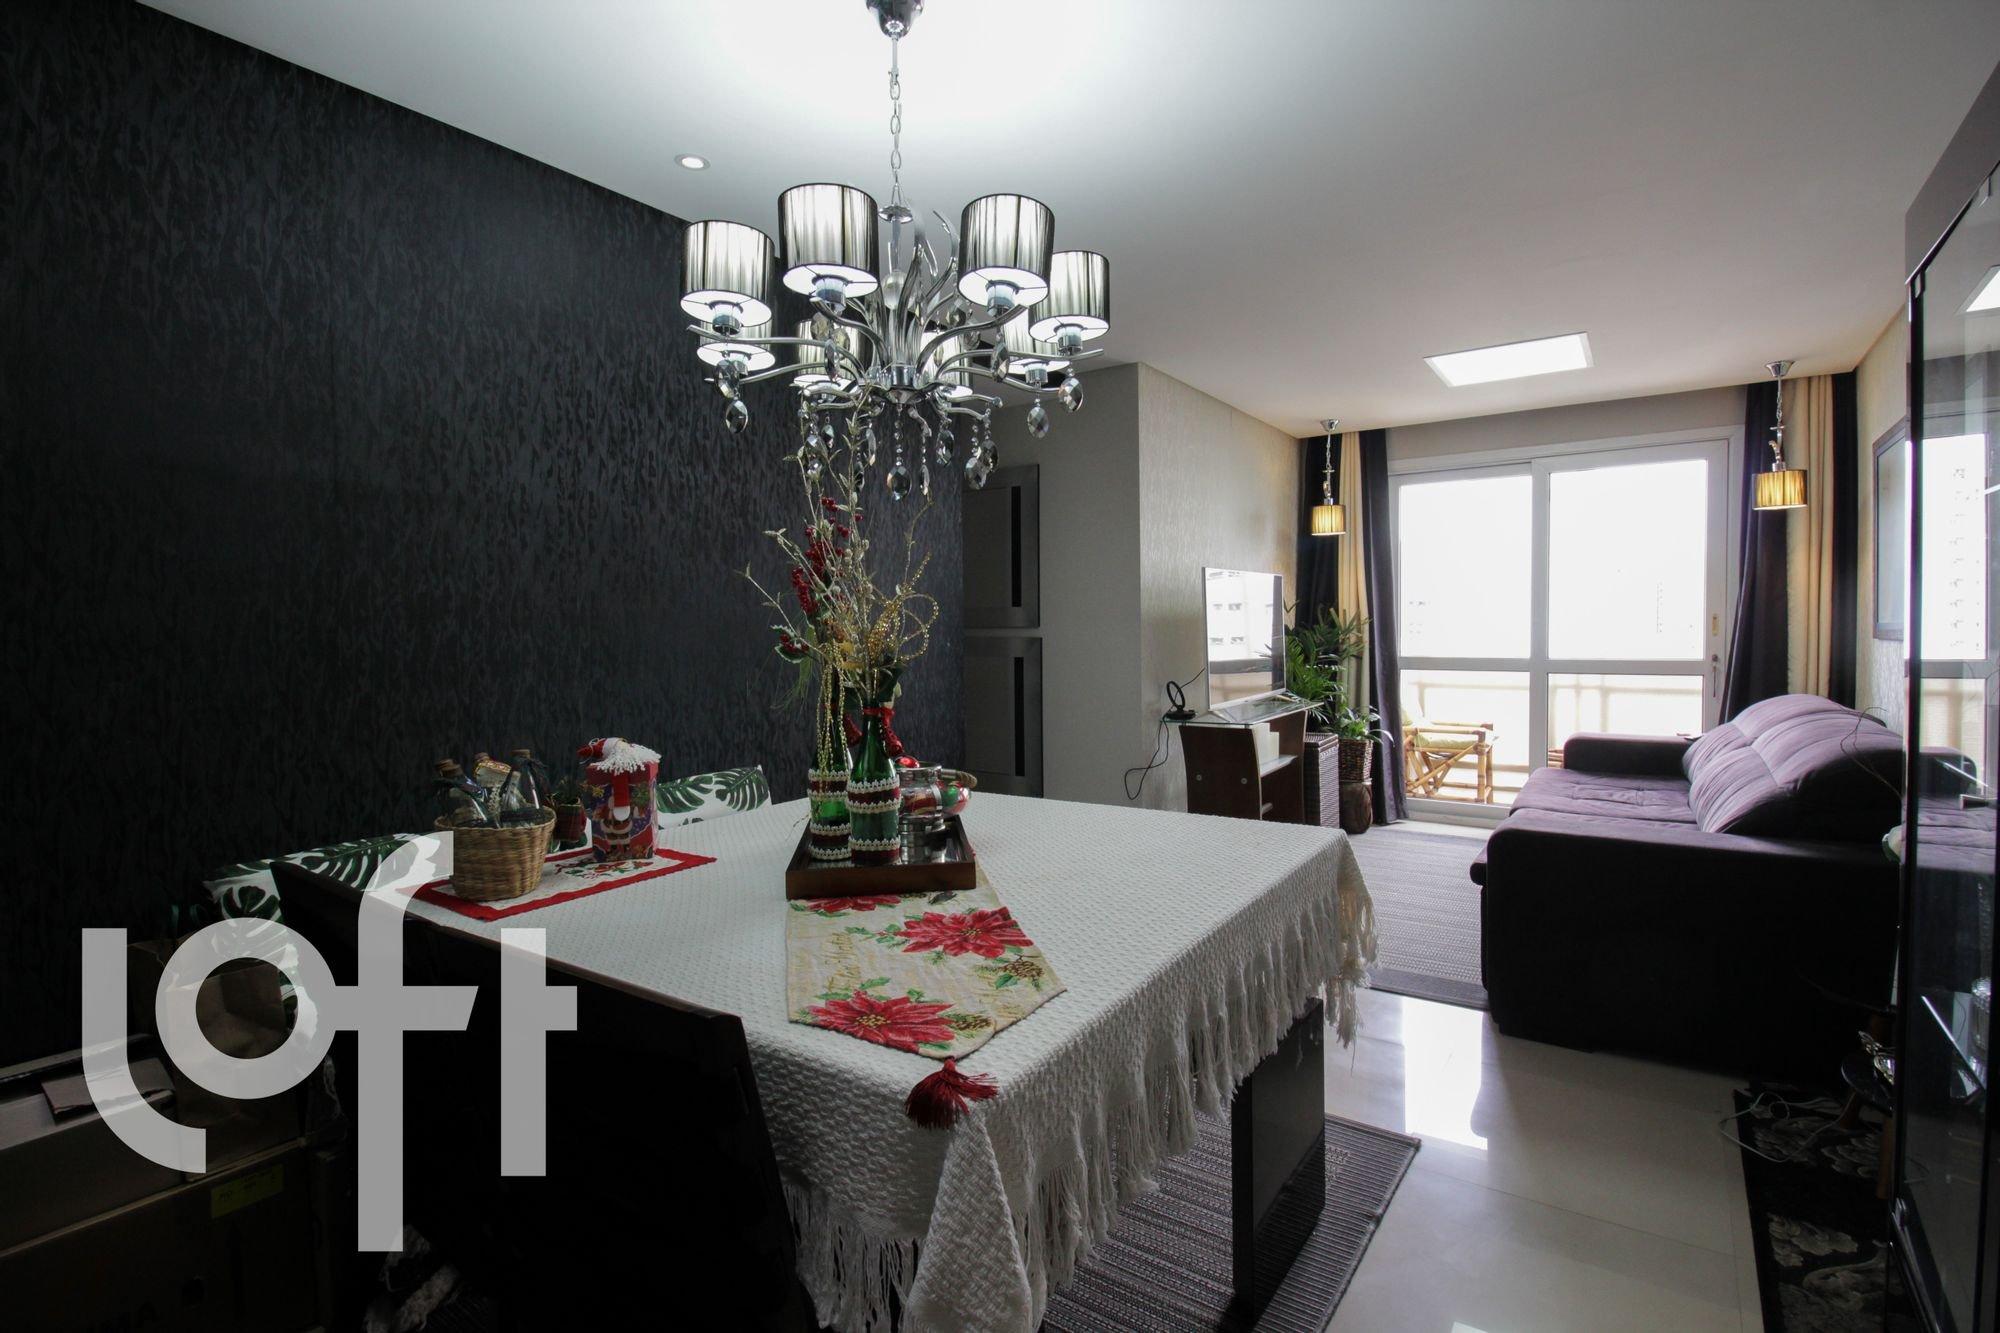 Foto de Sala com cama, vaso de planta, vaso, cadeira, mesa de jantar